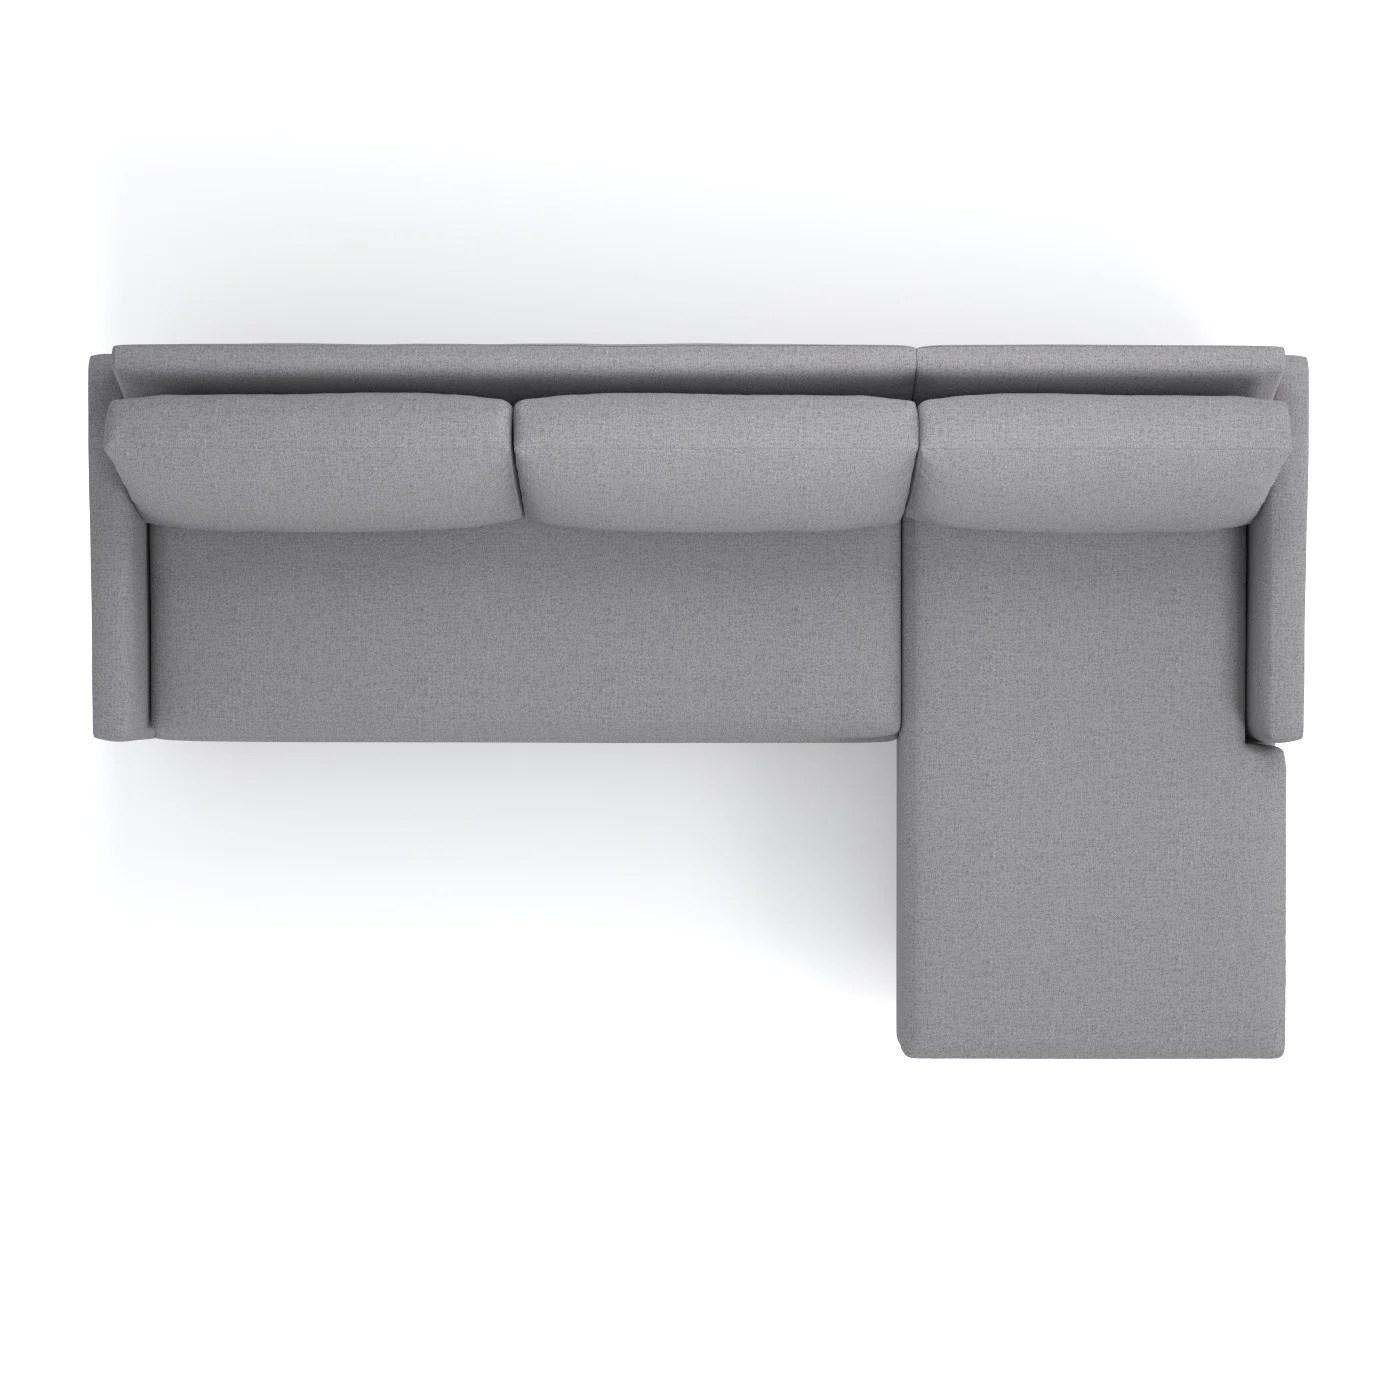 apt size sectional sofas beige decor scott 2pc sofa from kyle schuneman choice of ...